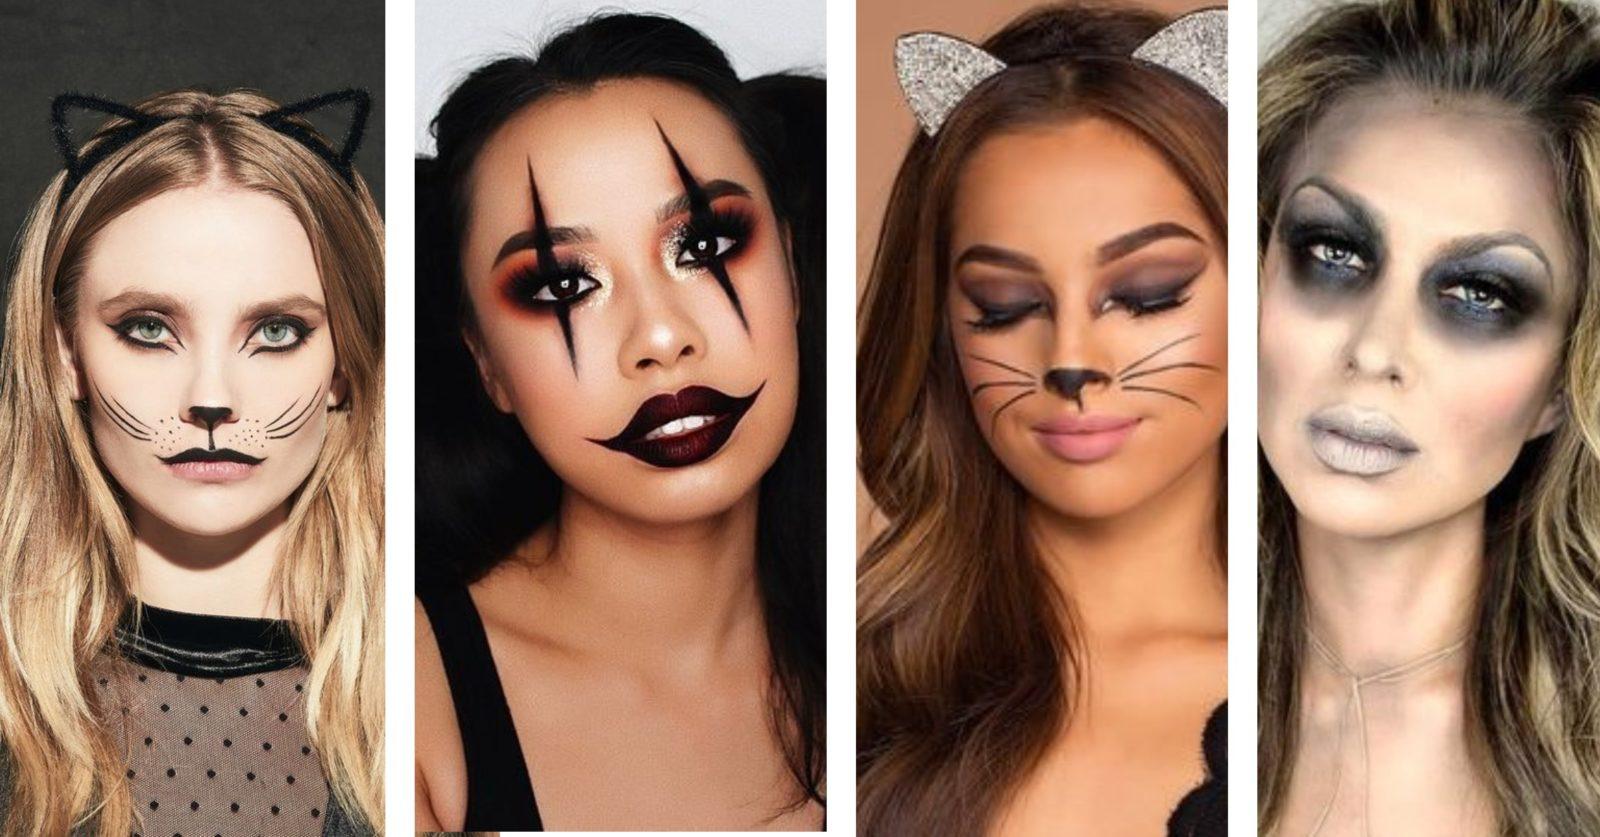 sustainable Halloween costumes - make up image